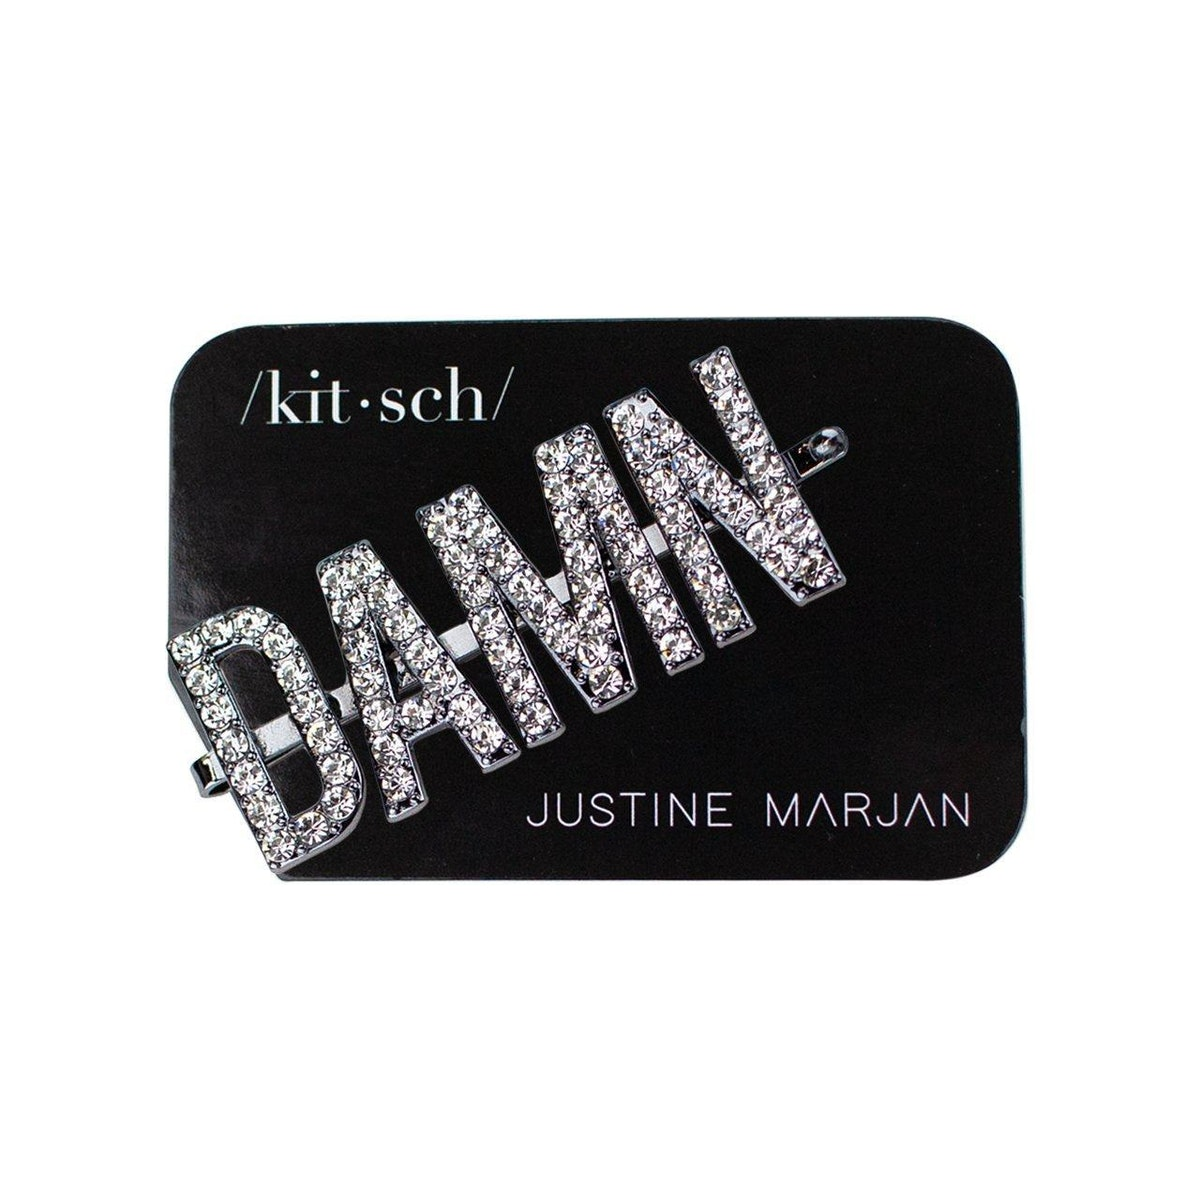 Kitsch x Justine Marjan 'DAMN' Rhinestone Bobby Pin